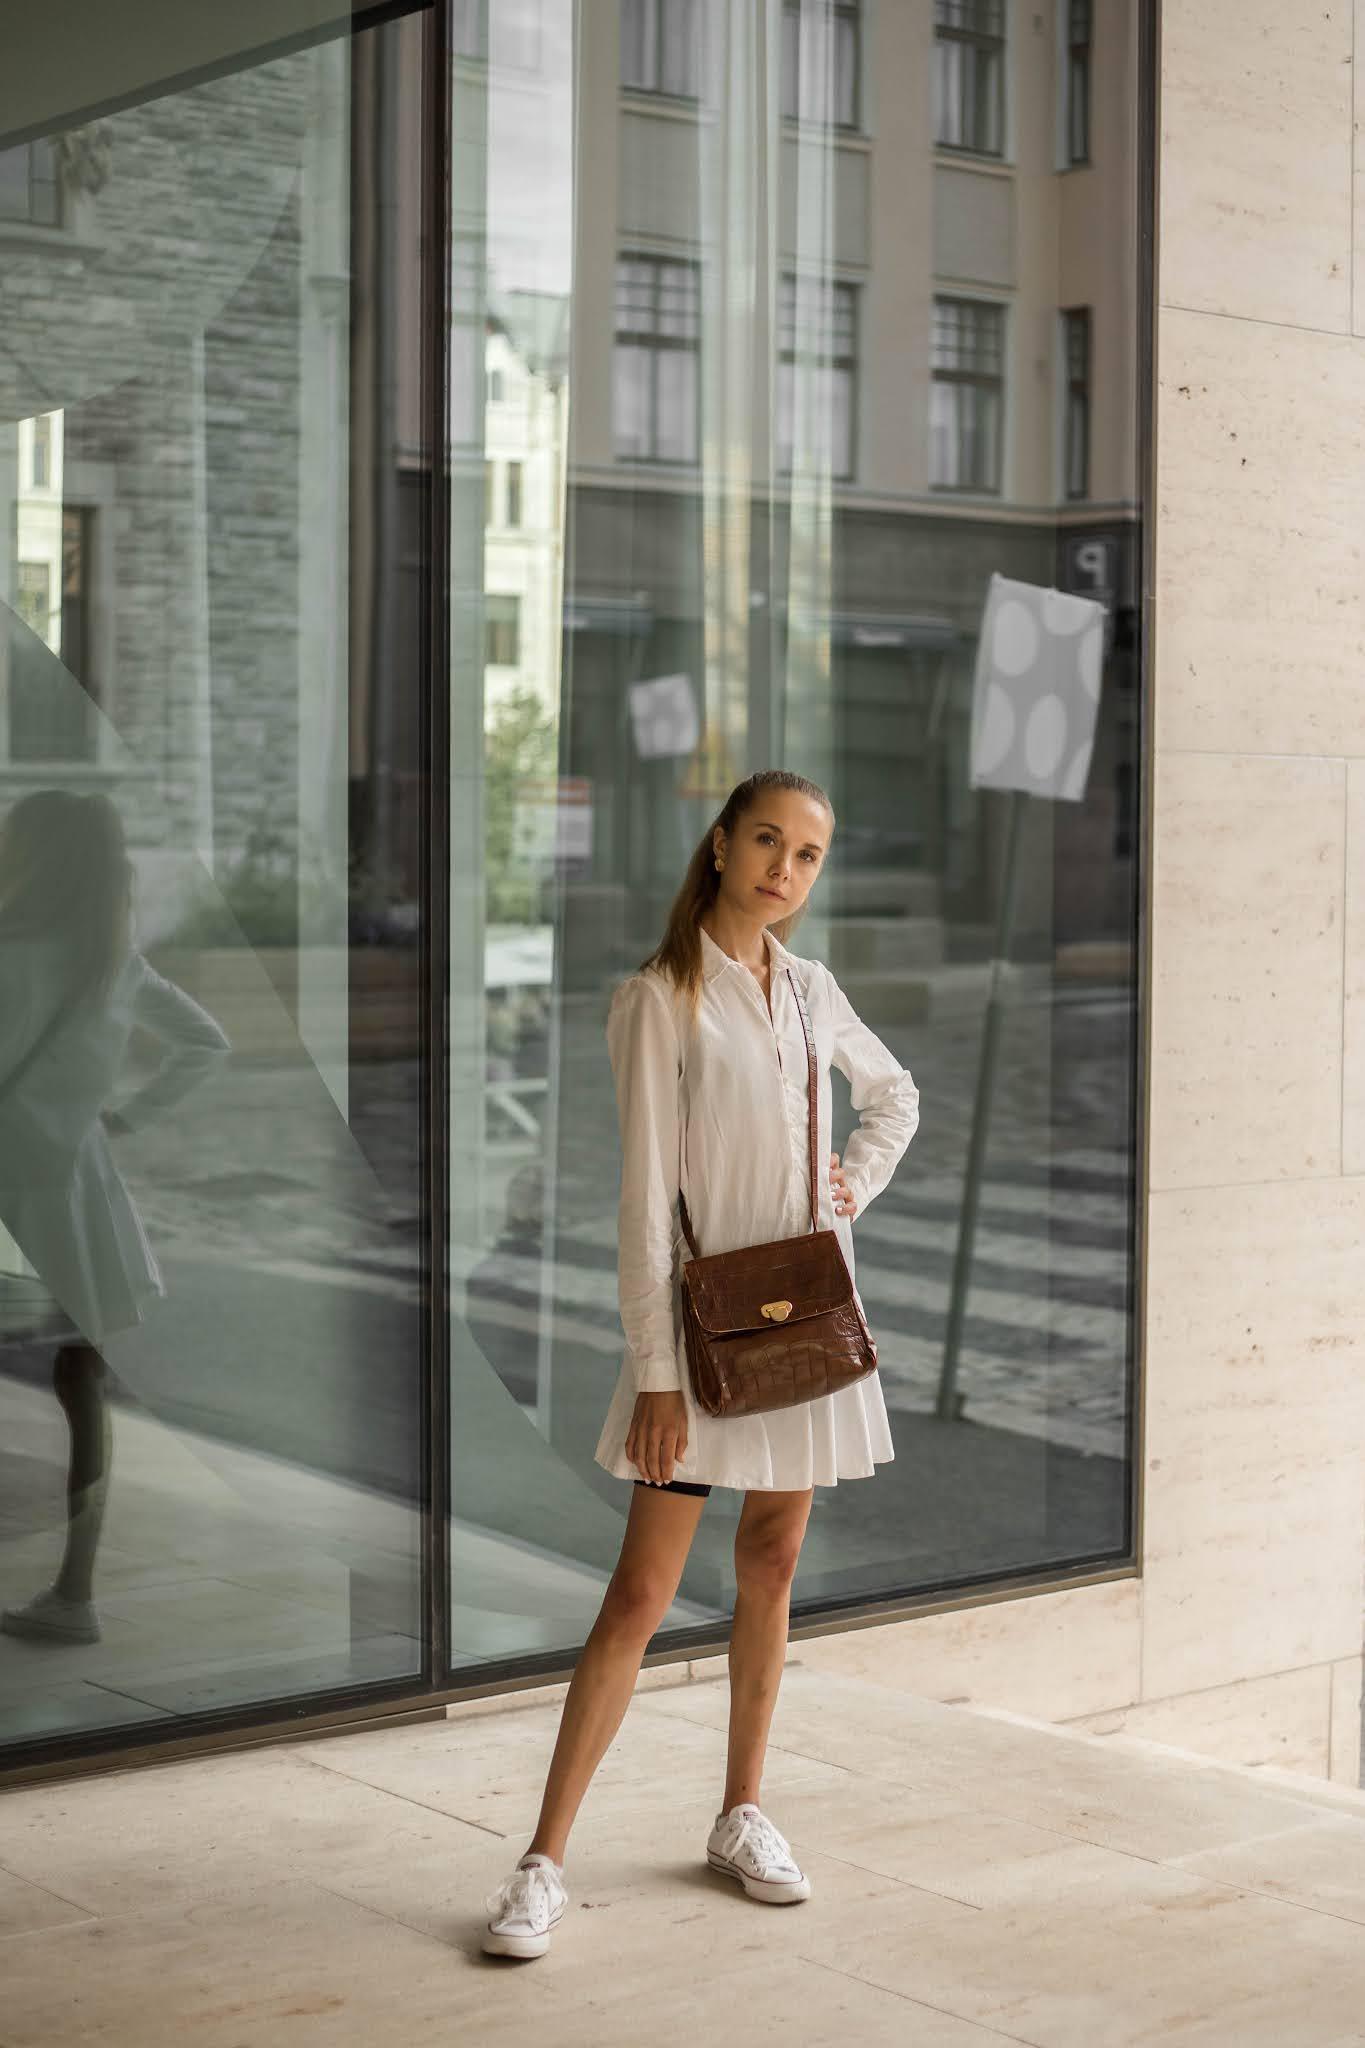 Valkoinen paitamekko ja ruskea vintage-laukku // White shirt dress and brown vintage bag